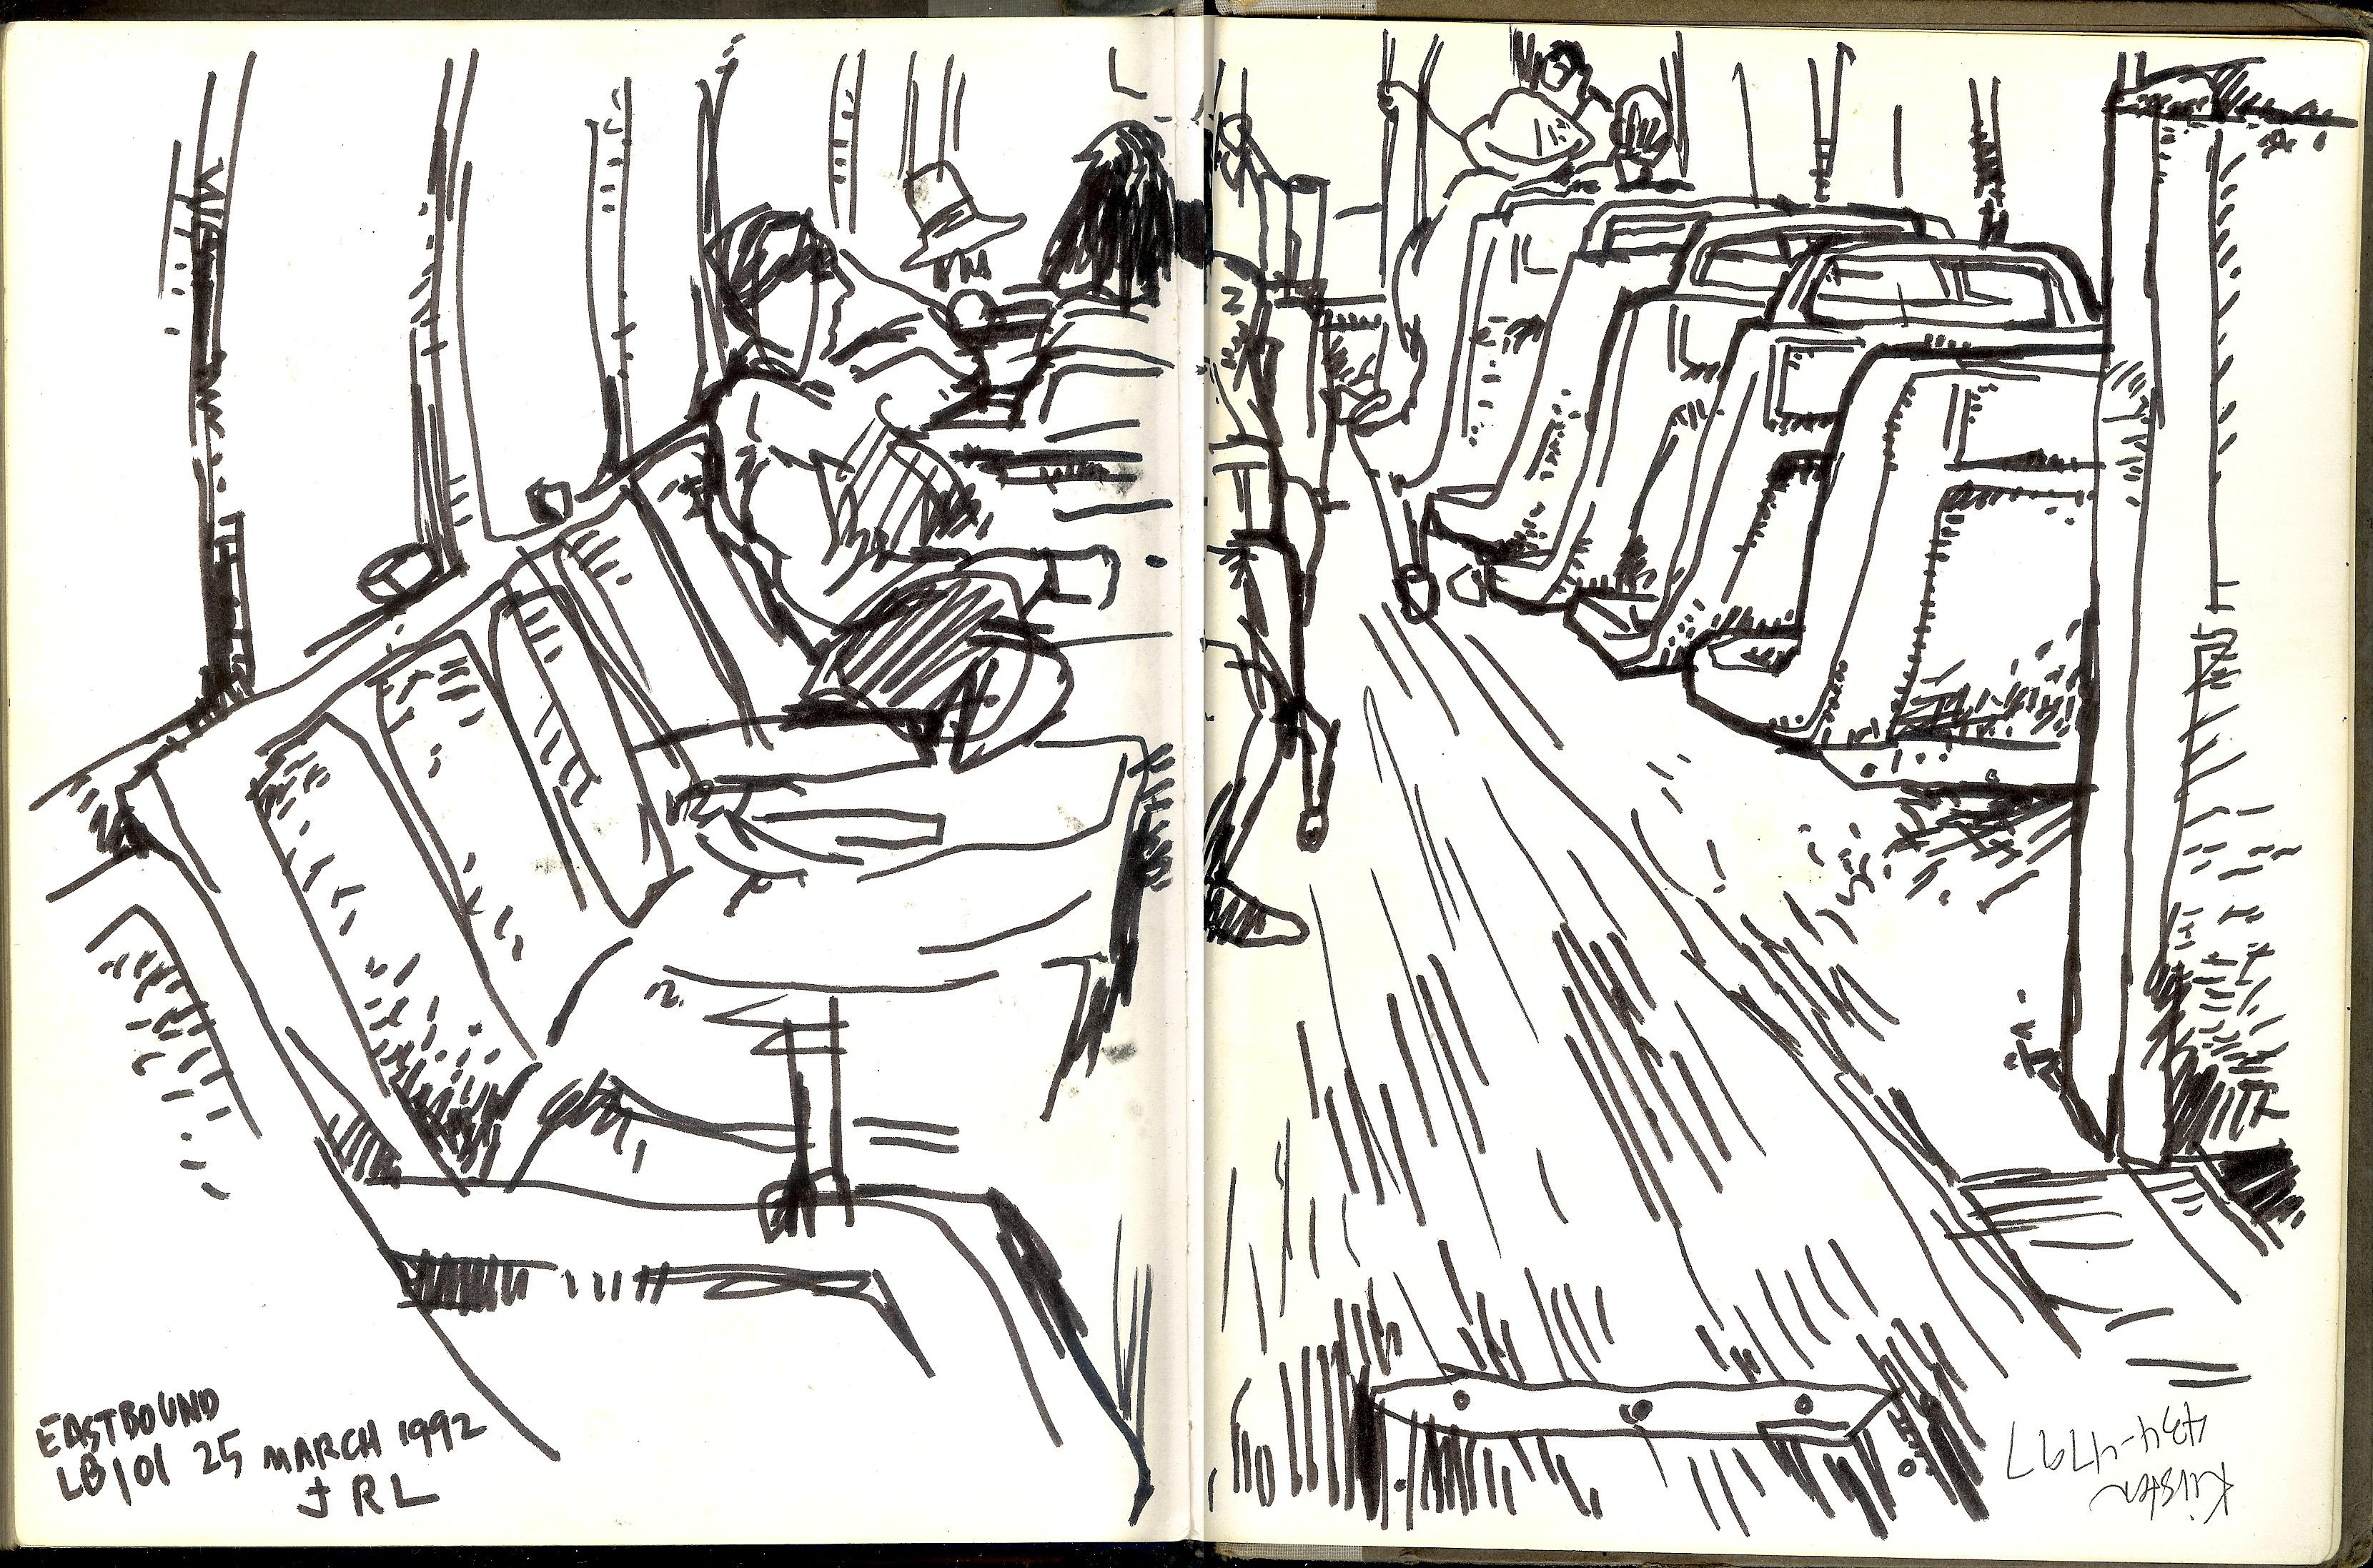 Línea 101 rumbo al este en Long Beach. 25 de marzo de 1992.